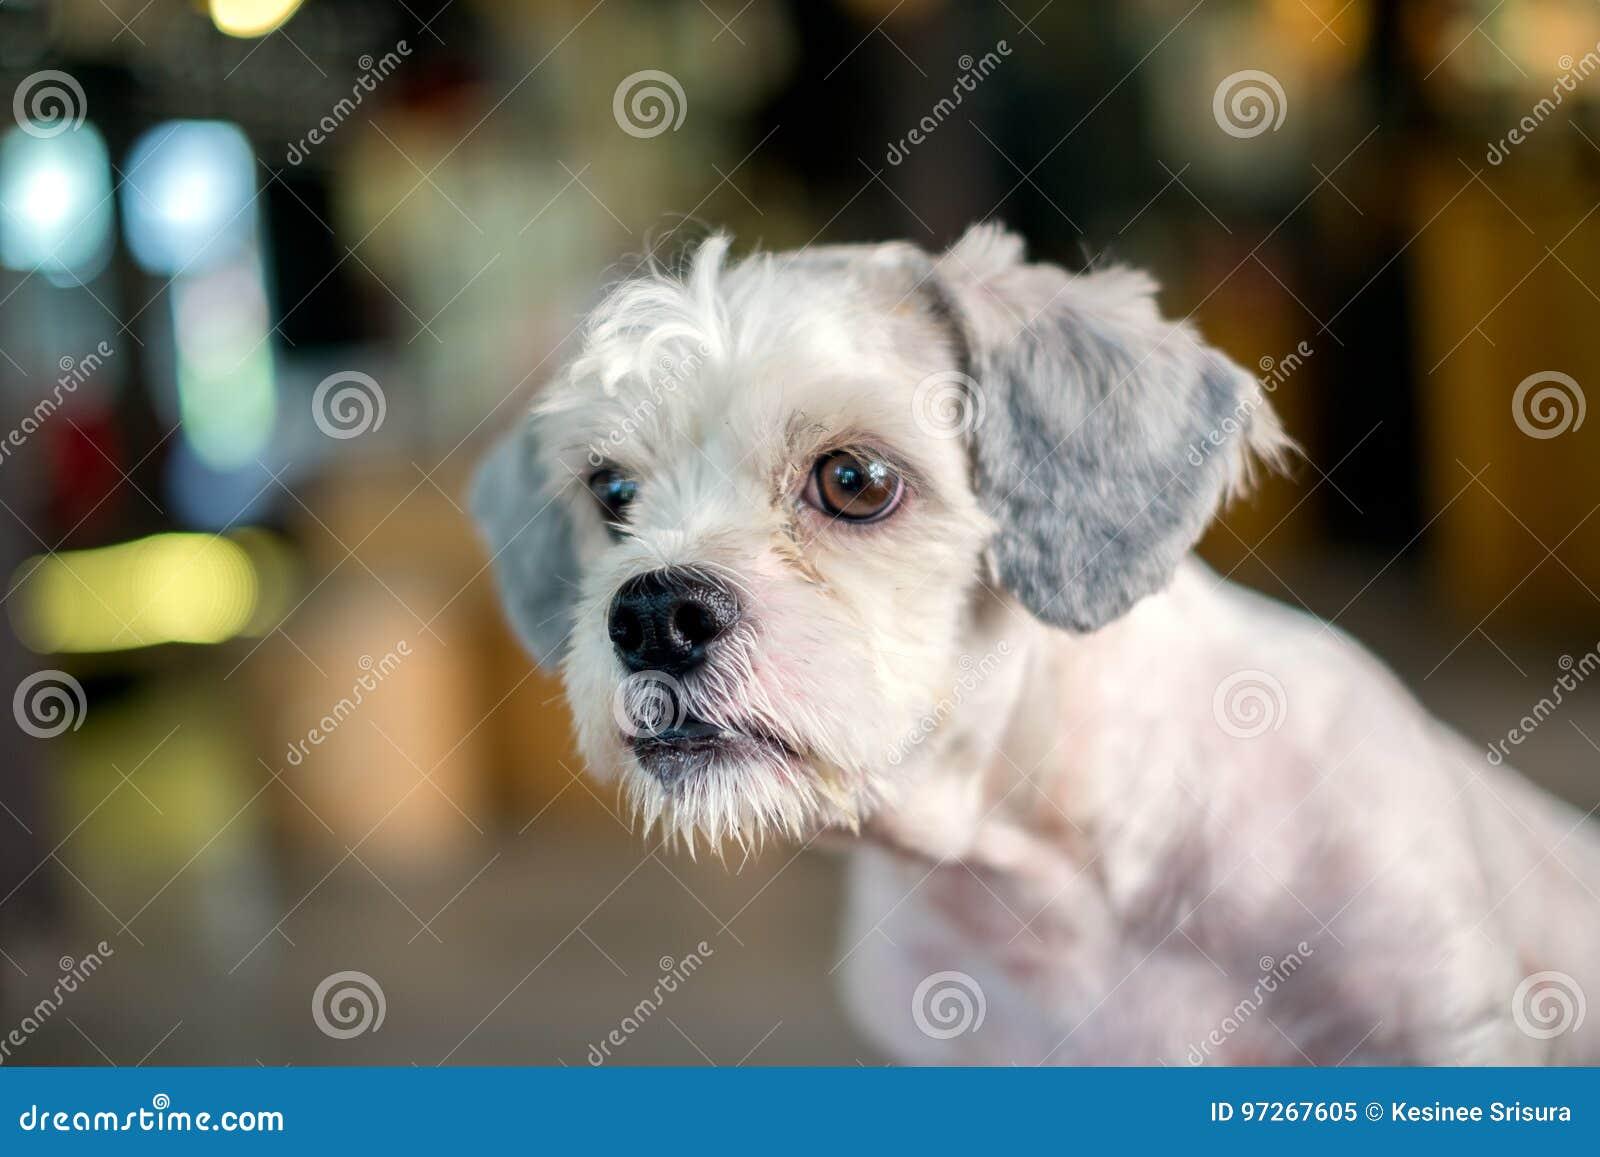 Short Hair White Shih Tzu Dog Gaze At Something Stock Image Image